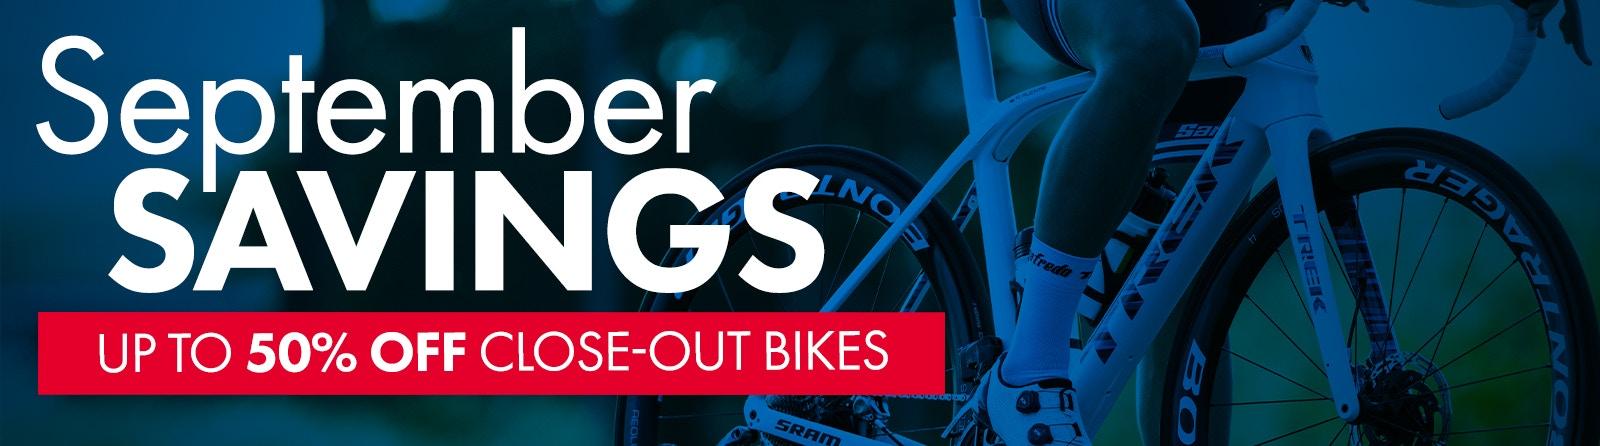 September Savings Tri Bike Run Up to 50% off bikes